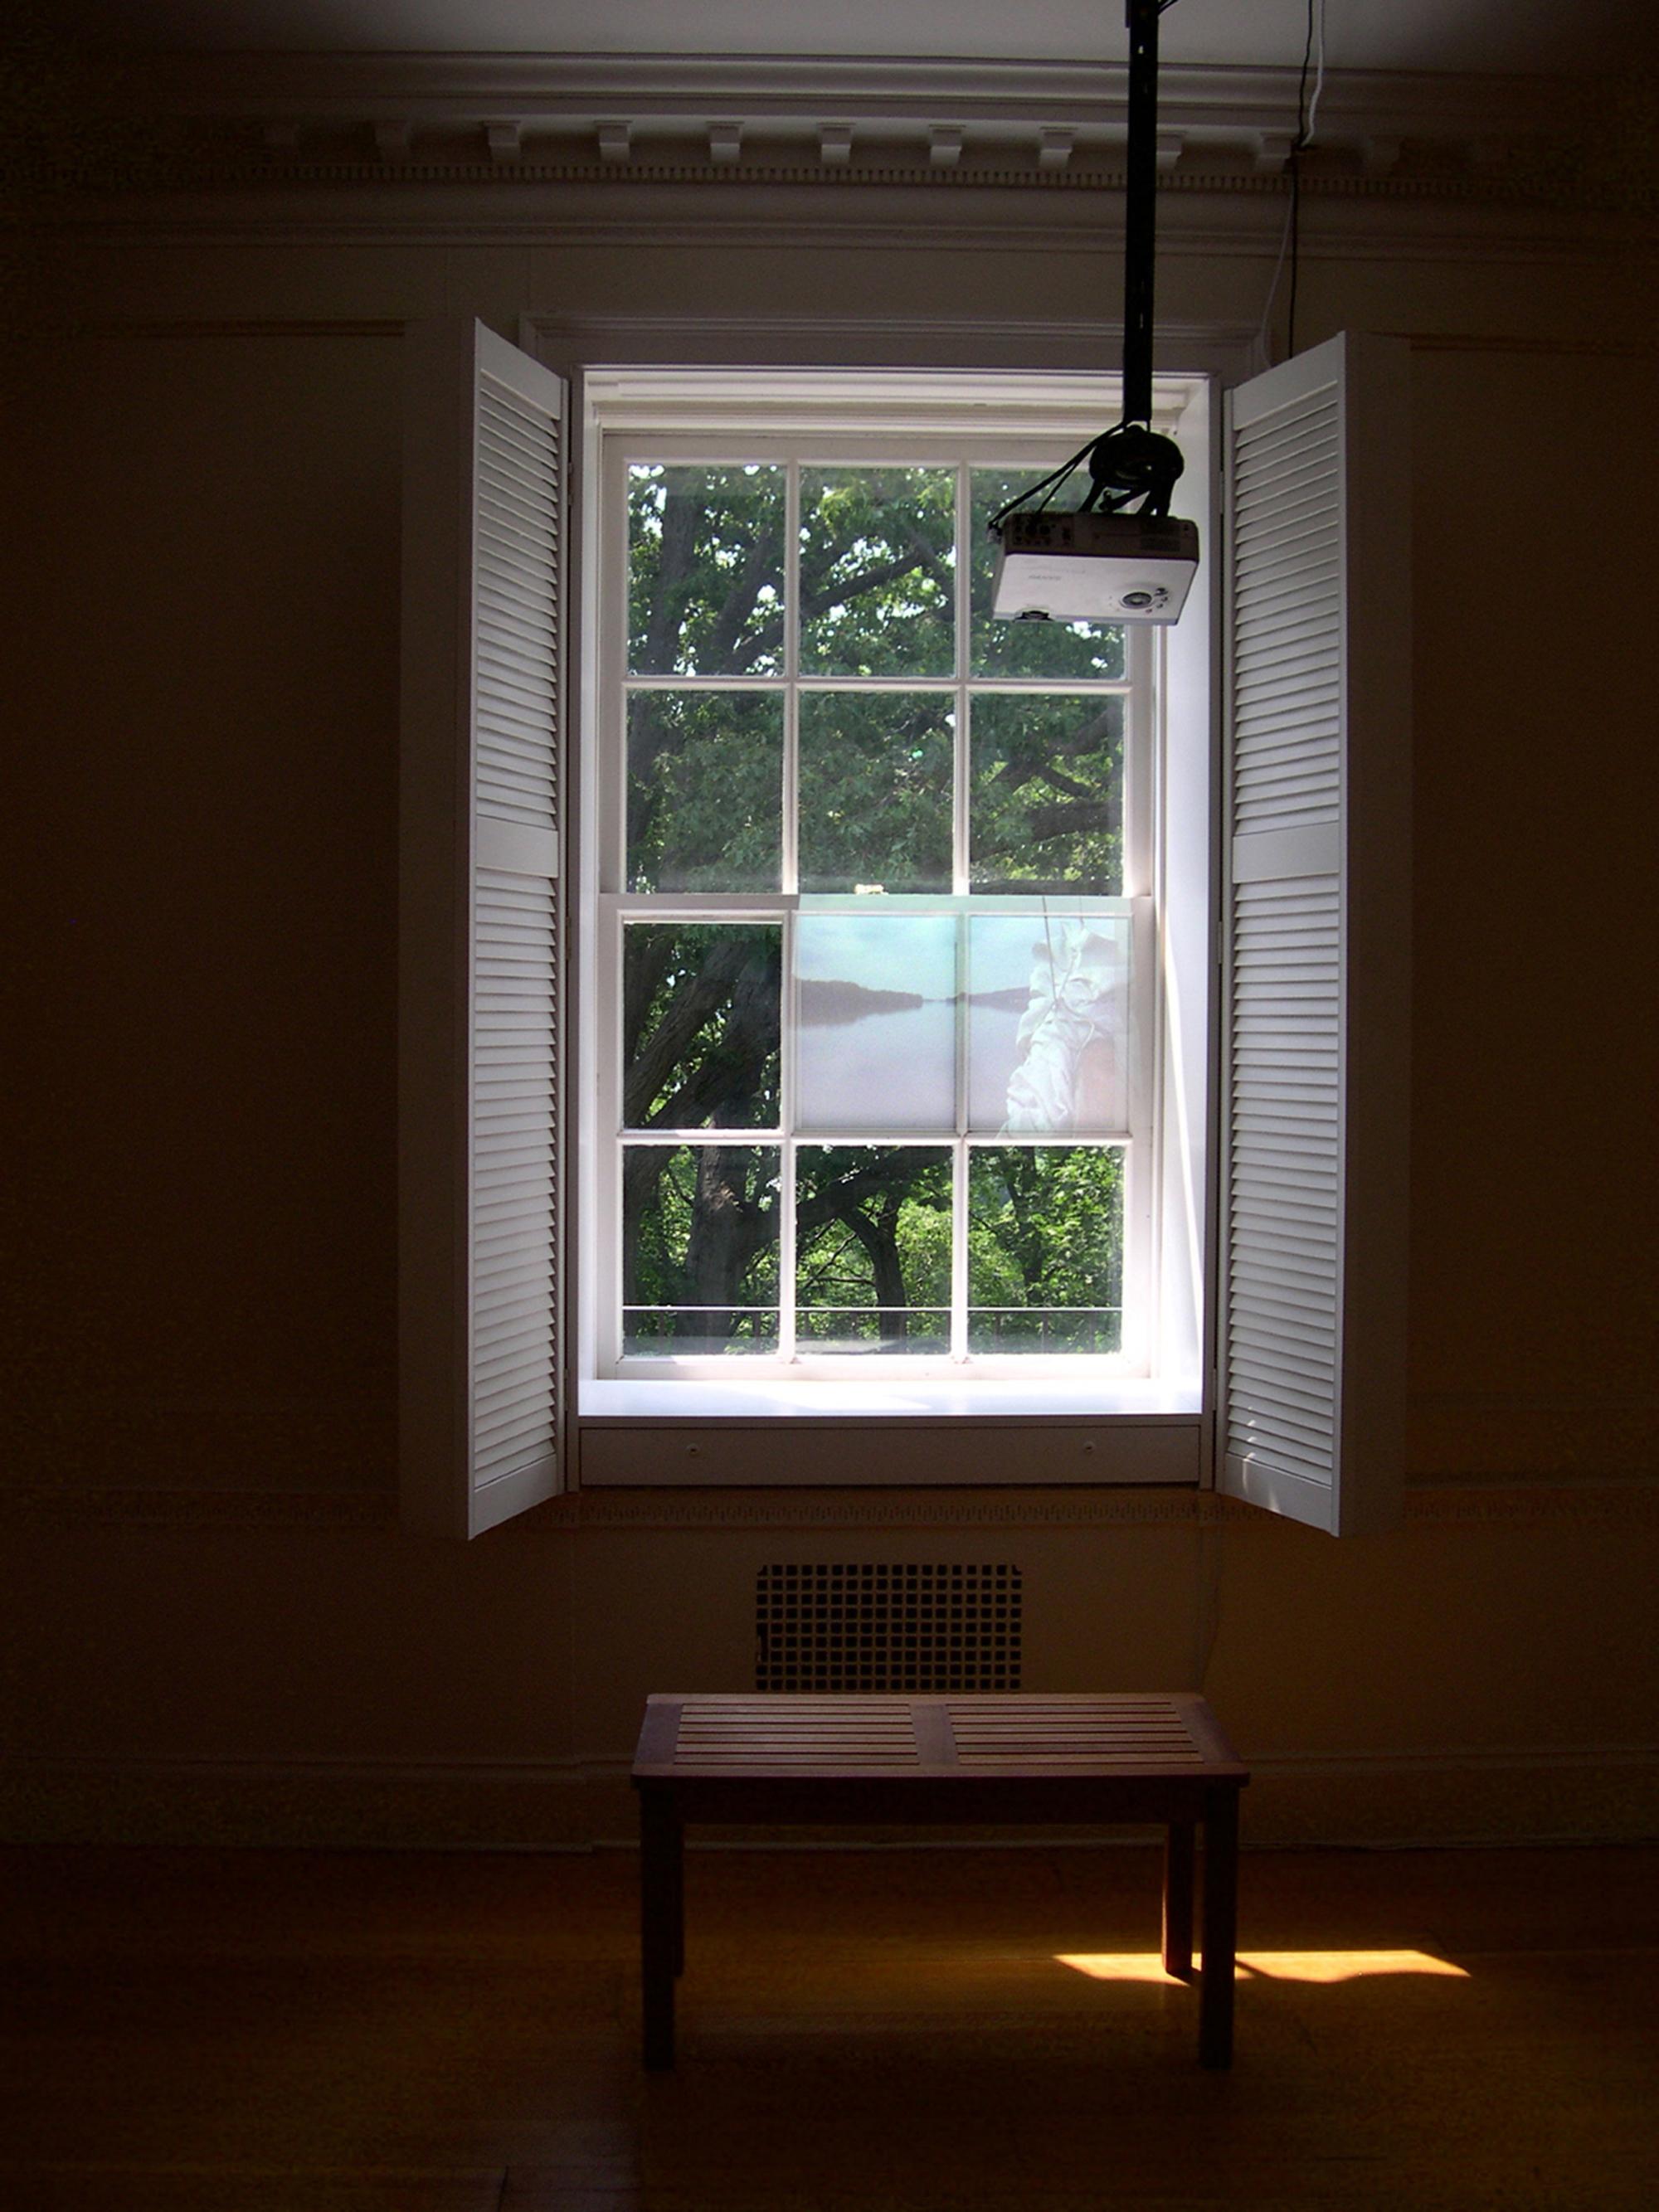 2_hudson-weather-fugues-w-window.jpg